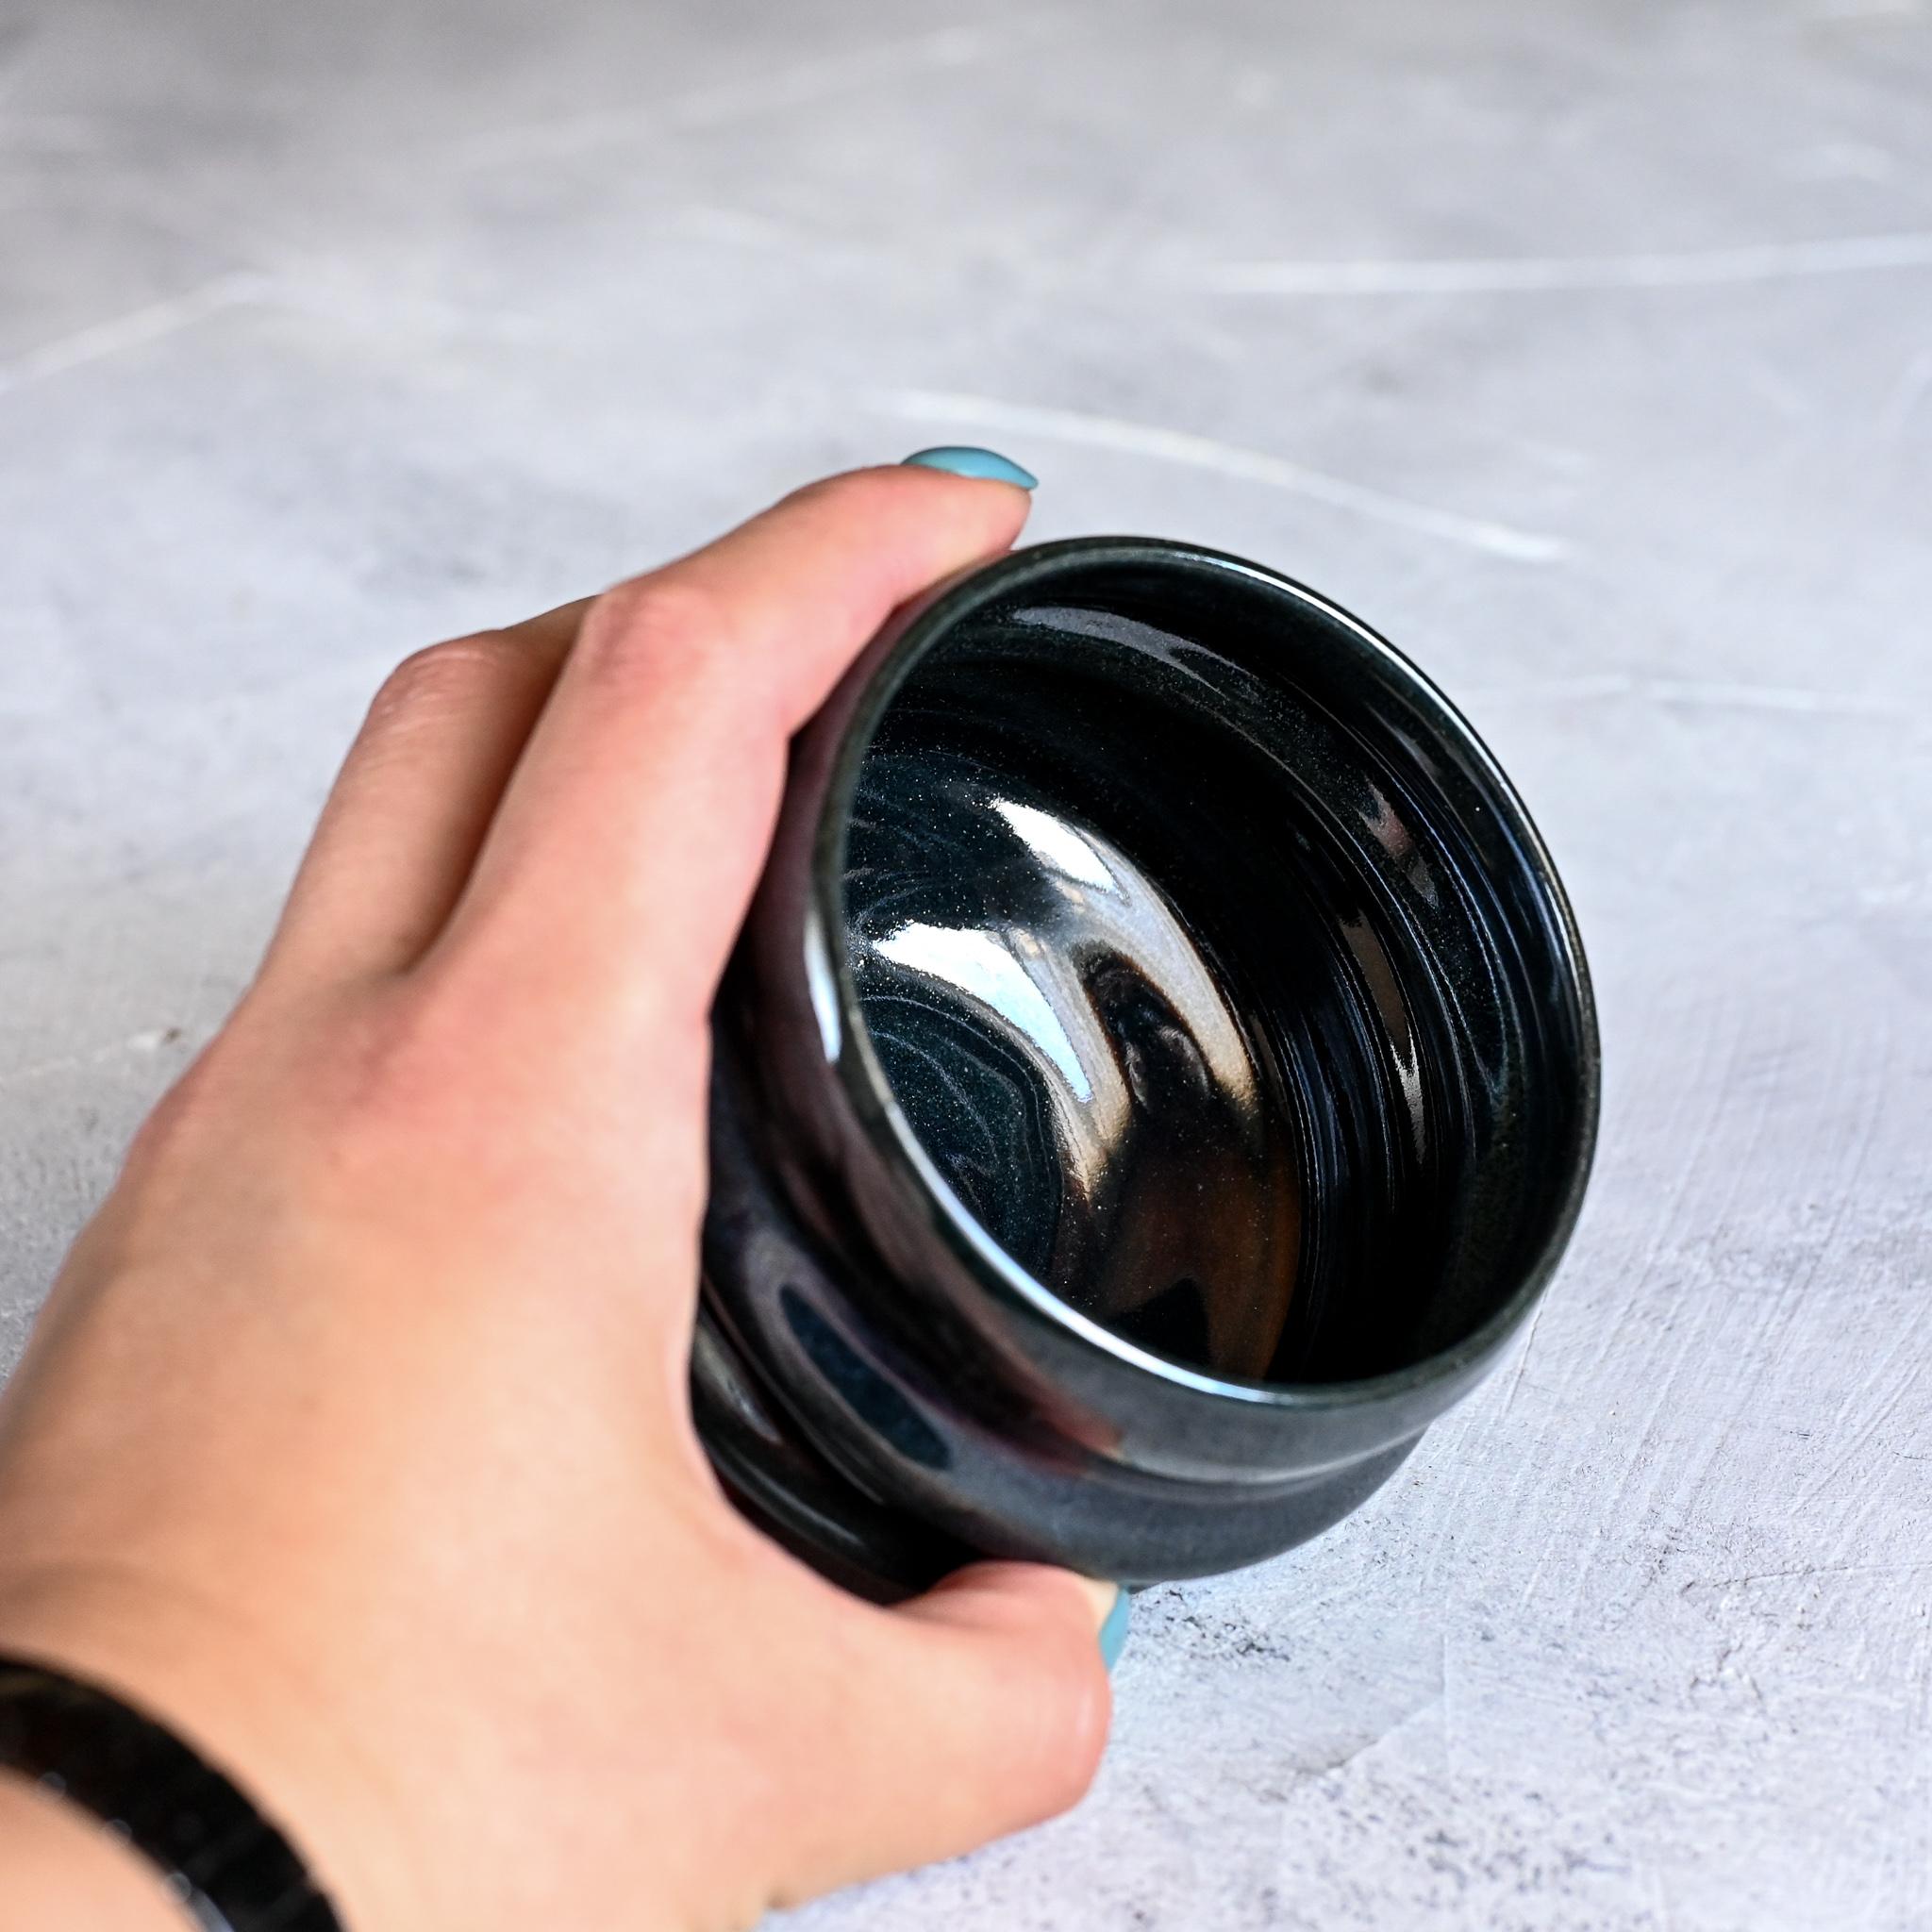 картинка Керамический стакан юноми Марии Левиной 10 - DishWishes.Ru